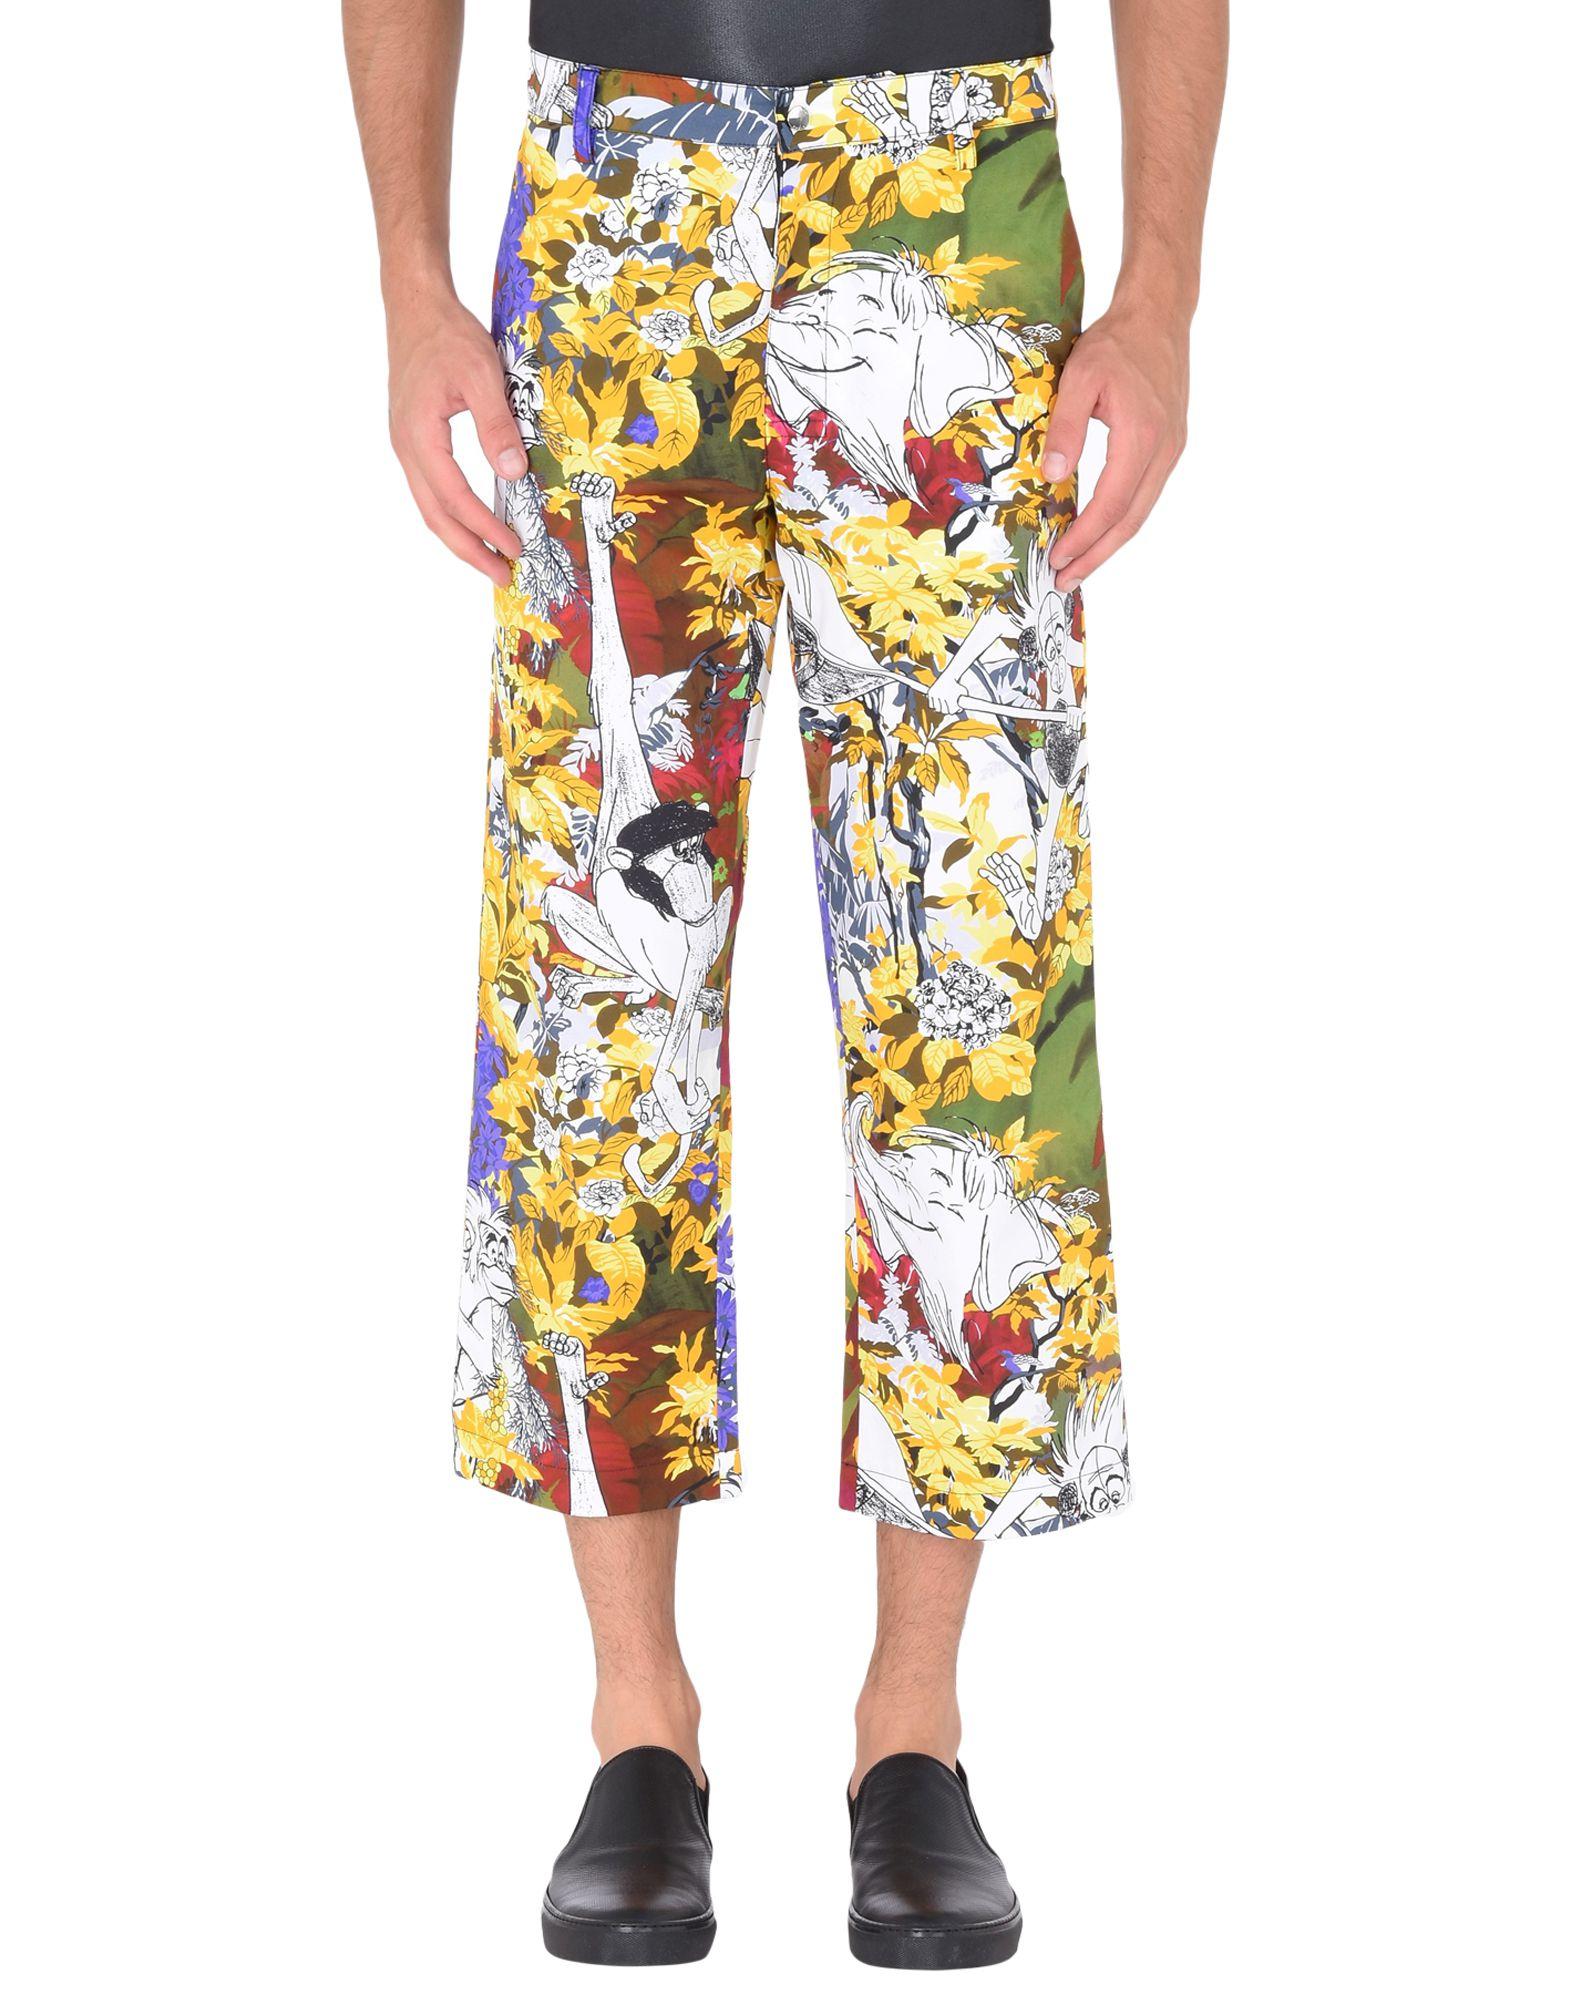 Kenzo X Disney Casual Pants